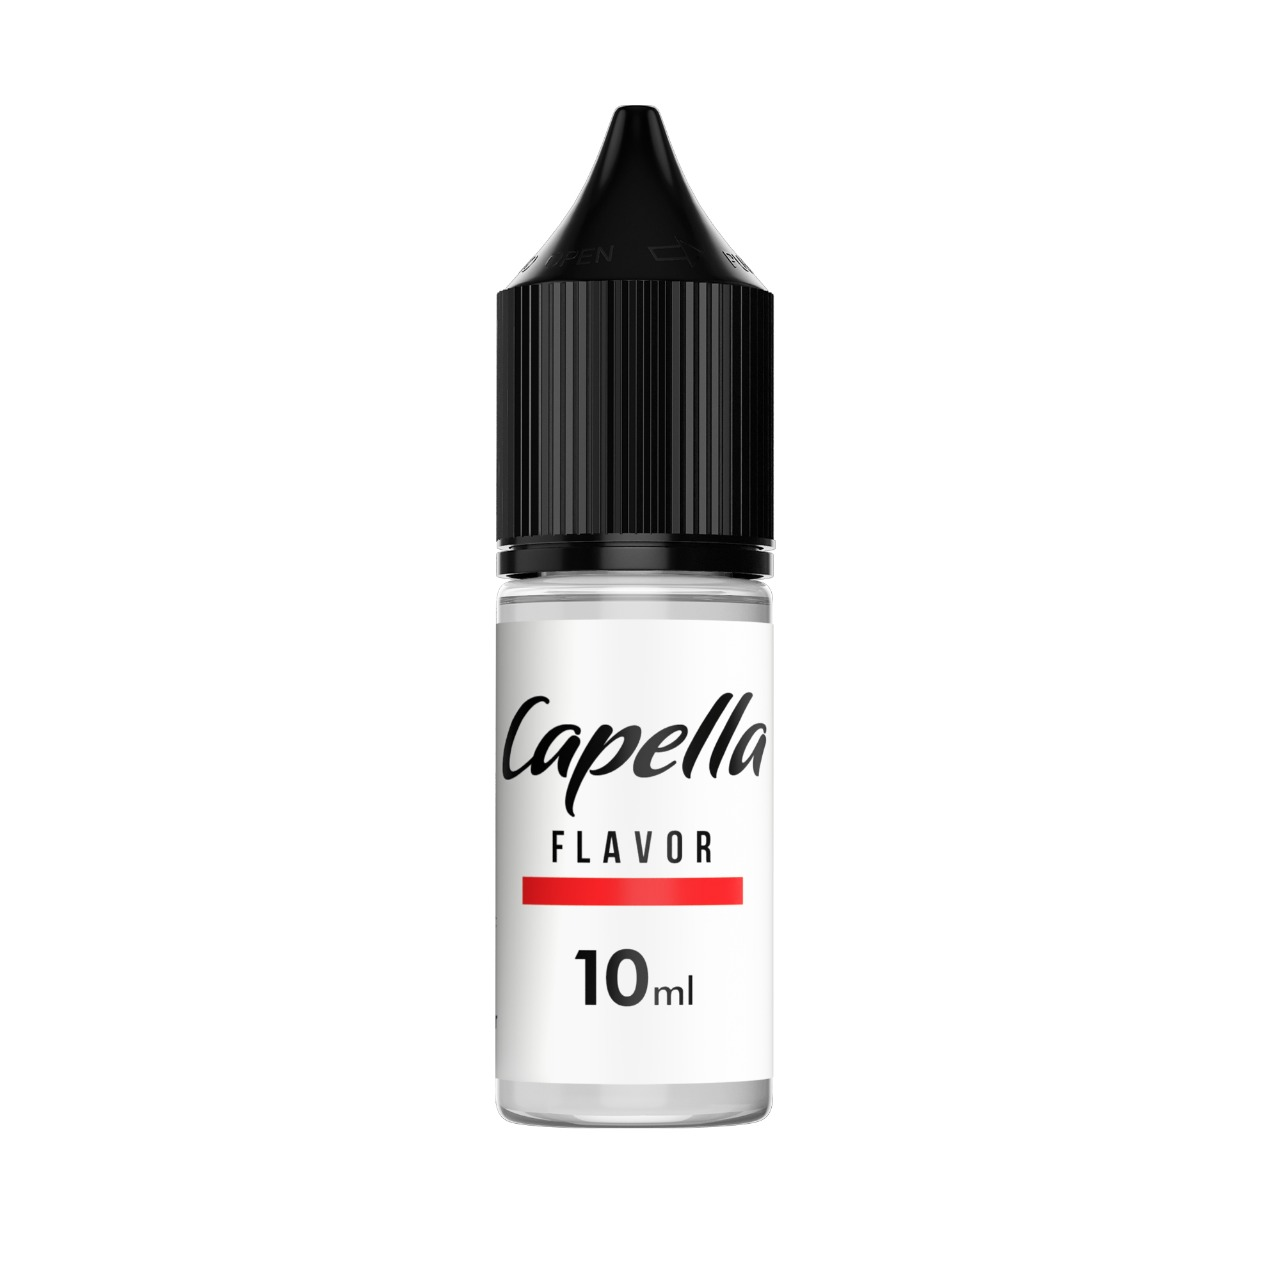 Capella (CAP) Strawberries and Cream 10ml